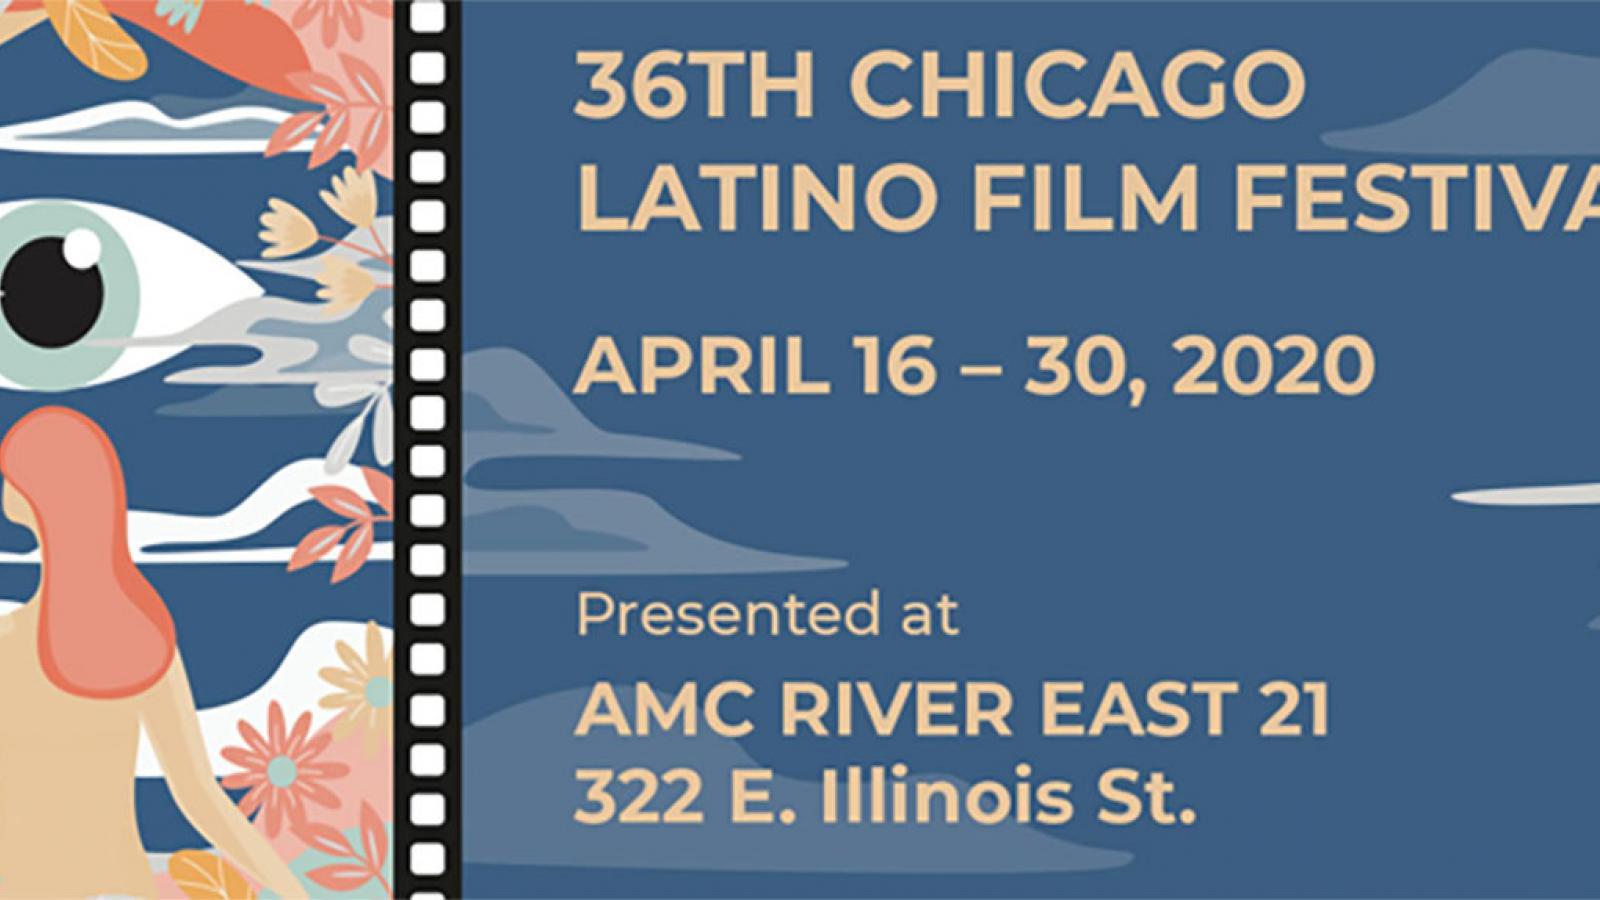 36th Chicago Latino Film Festival